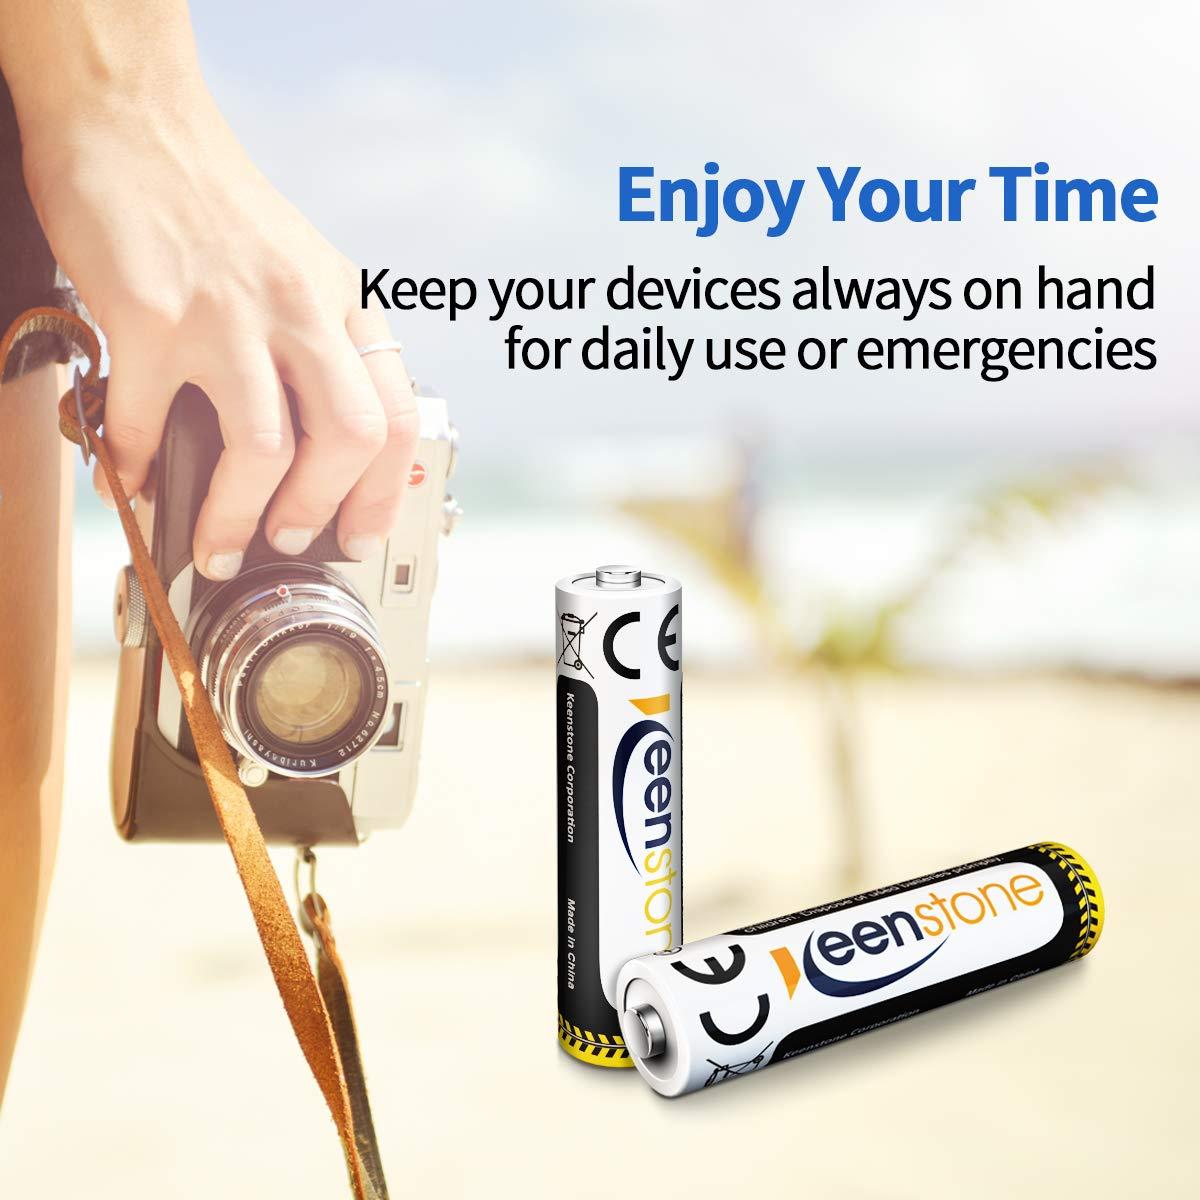 Keenstone AAA Akku Wiederaufladbar, 1.2V 1100mAh Micro AAA Batterien NiMHAkkus mit Ladegerät, geringe Selbstentladung, Ideal für DECT Telefon Kamera Fernbedienung Taschenlampe Controller, 8 Stücke